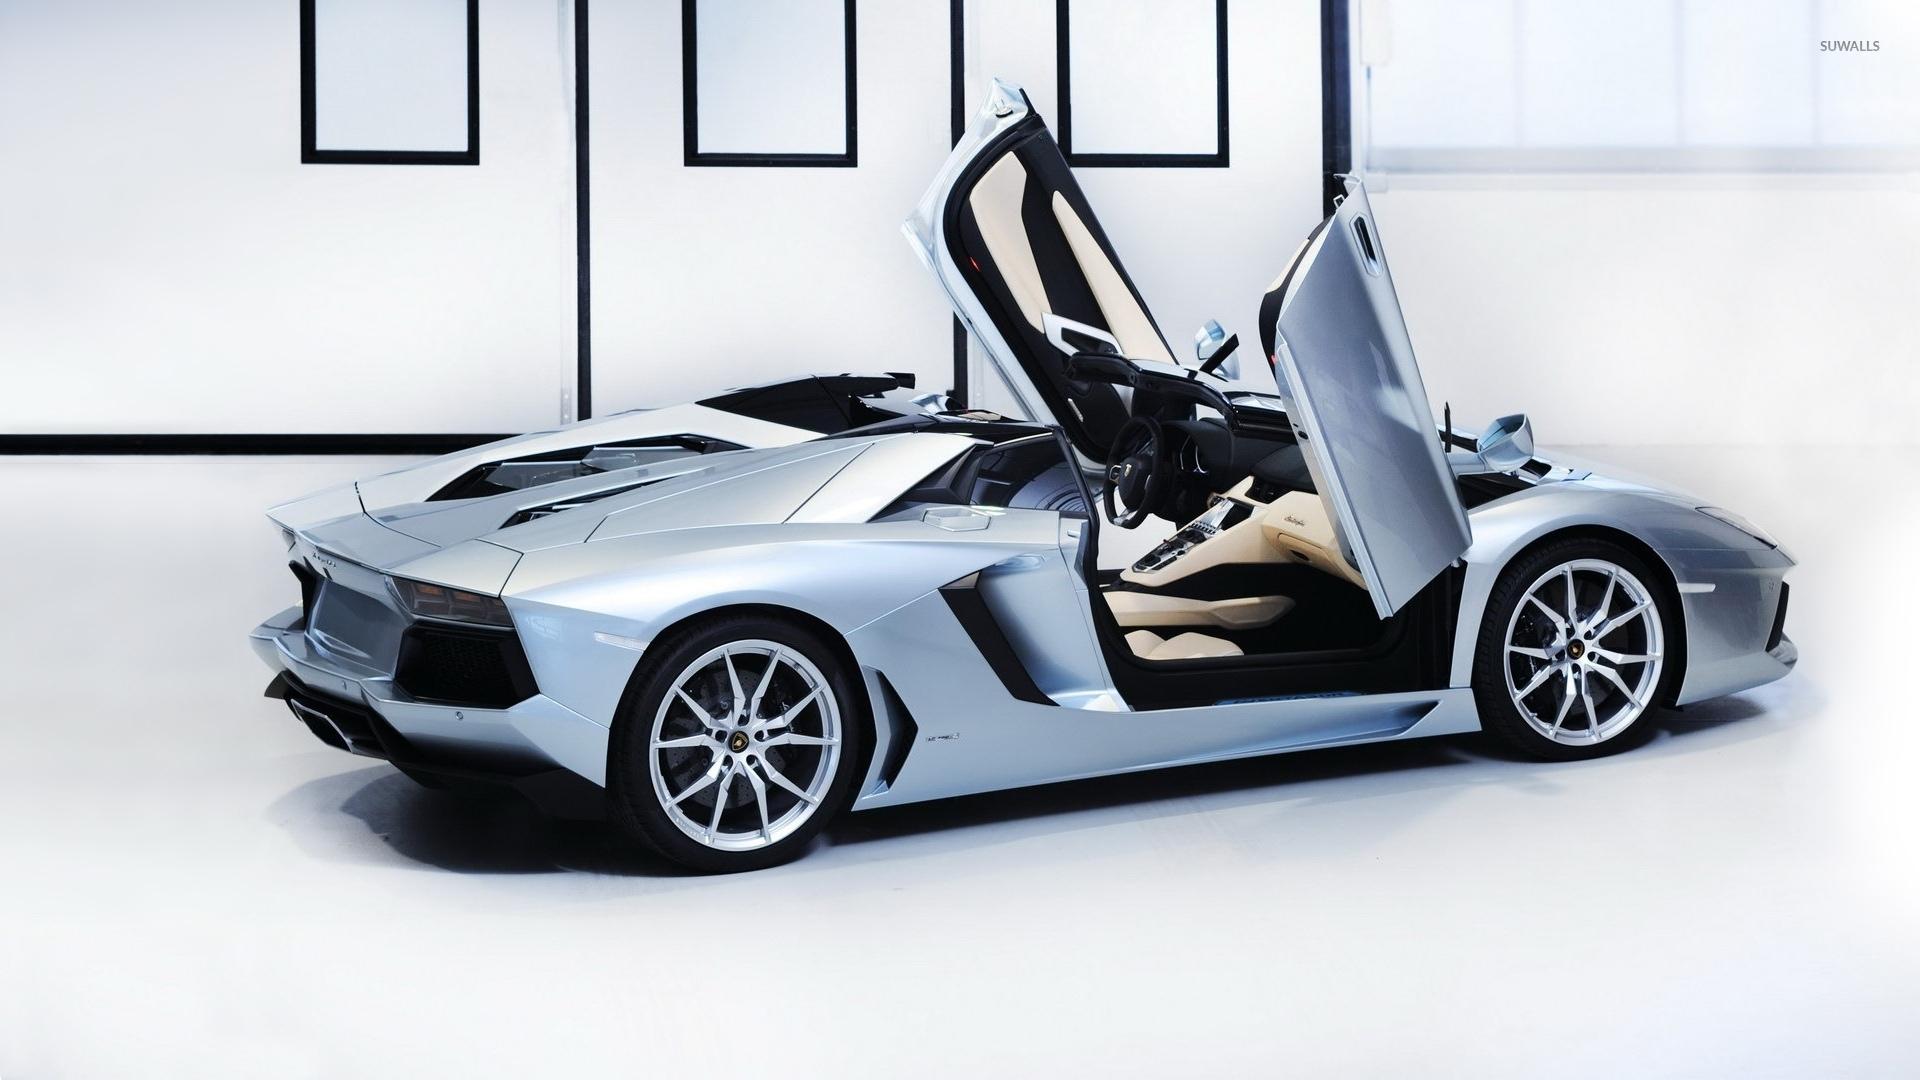 lamborghini aventador lp 700 4 roadster side view wallpaper - Lamborghini Aventador Roadster Wallpaper Hd 19201080